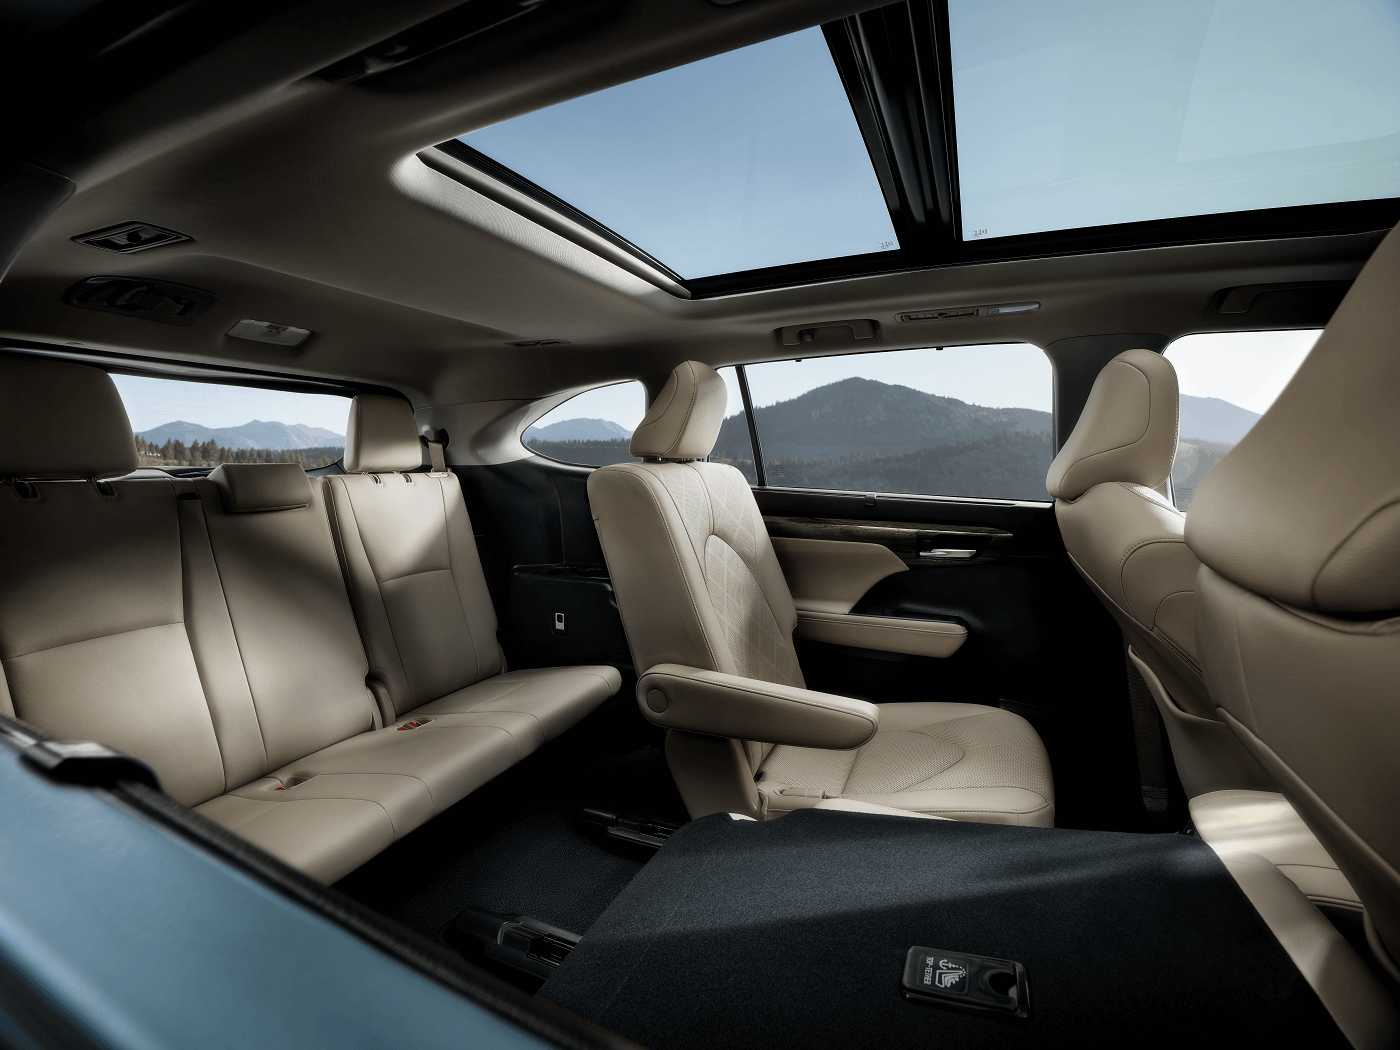 2020 Toyota Highlander Interior Cabin